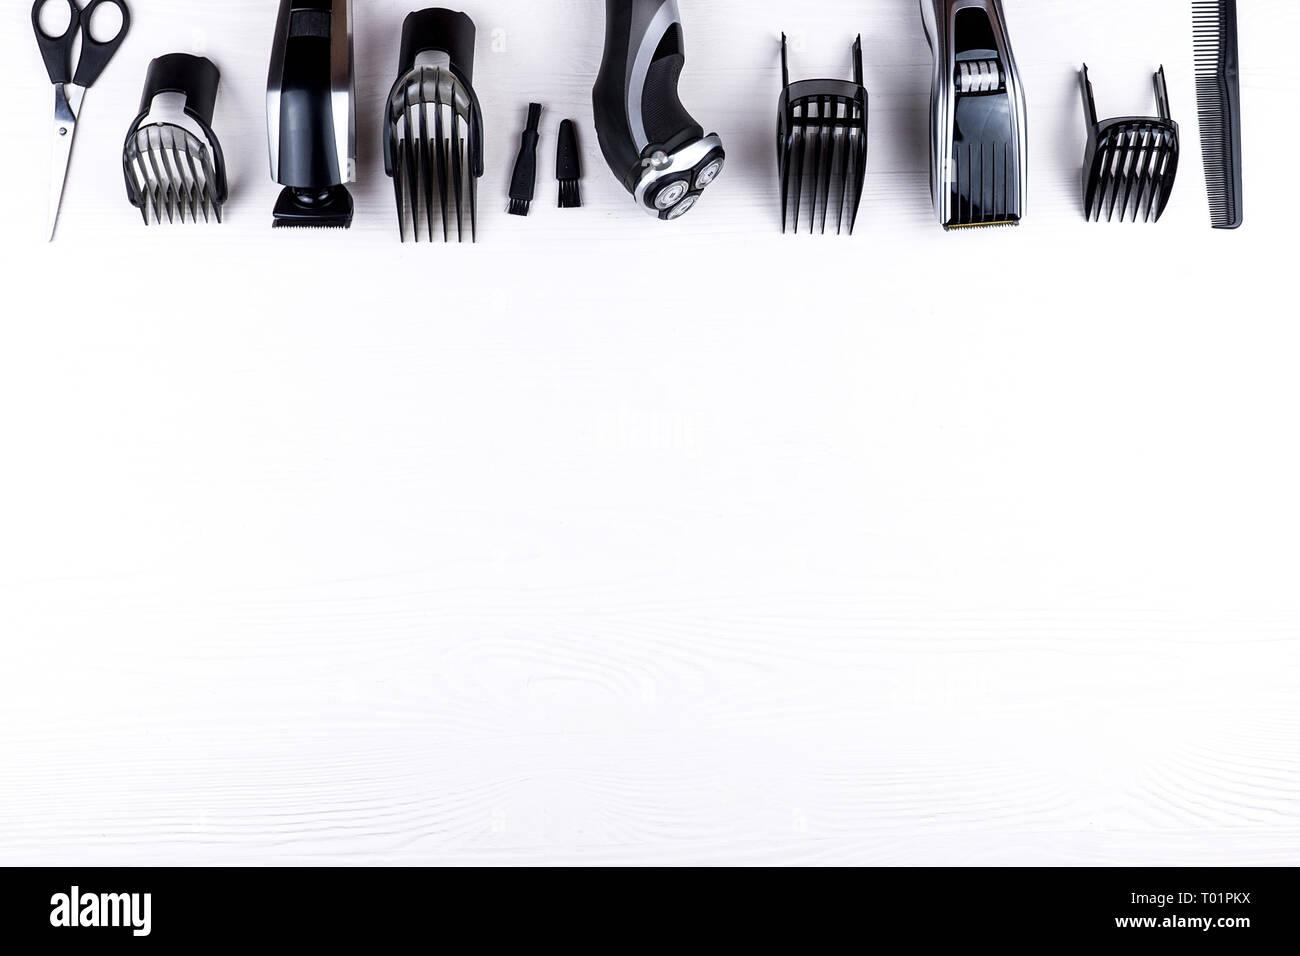 Hairdressing Equipment Stock Photos & Hairdressing Equipment ...